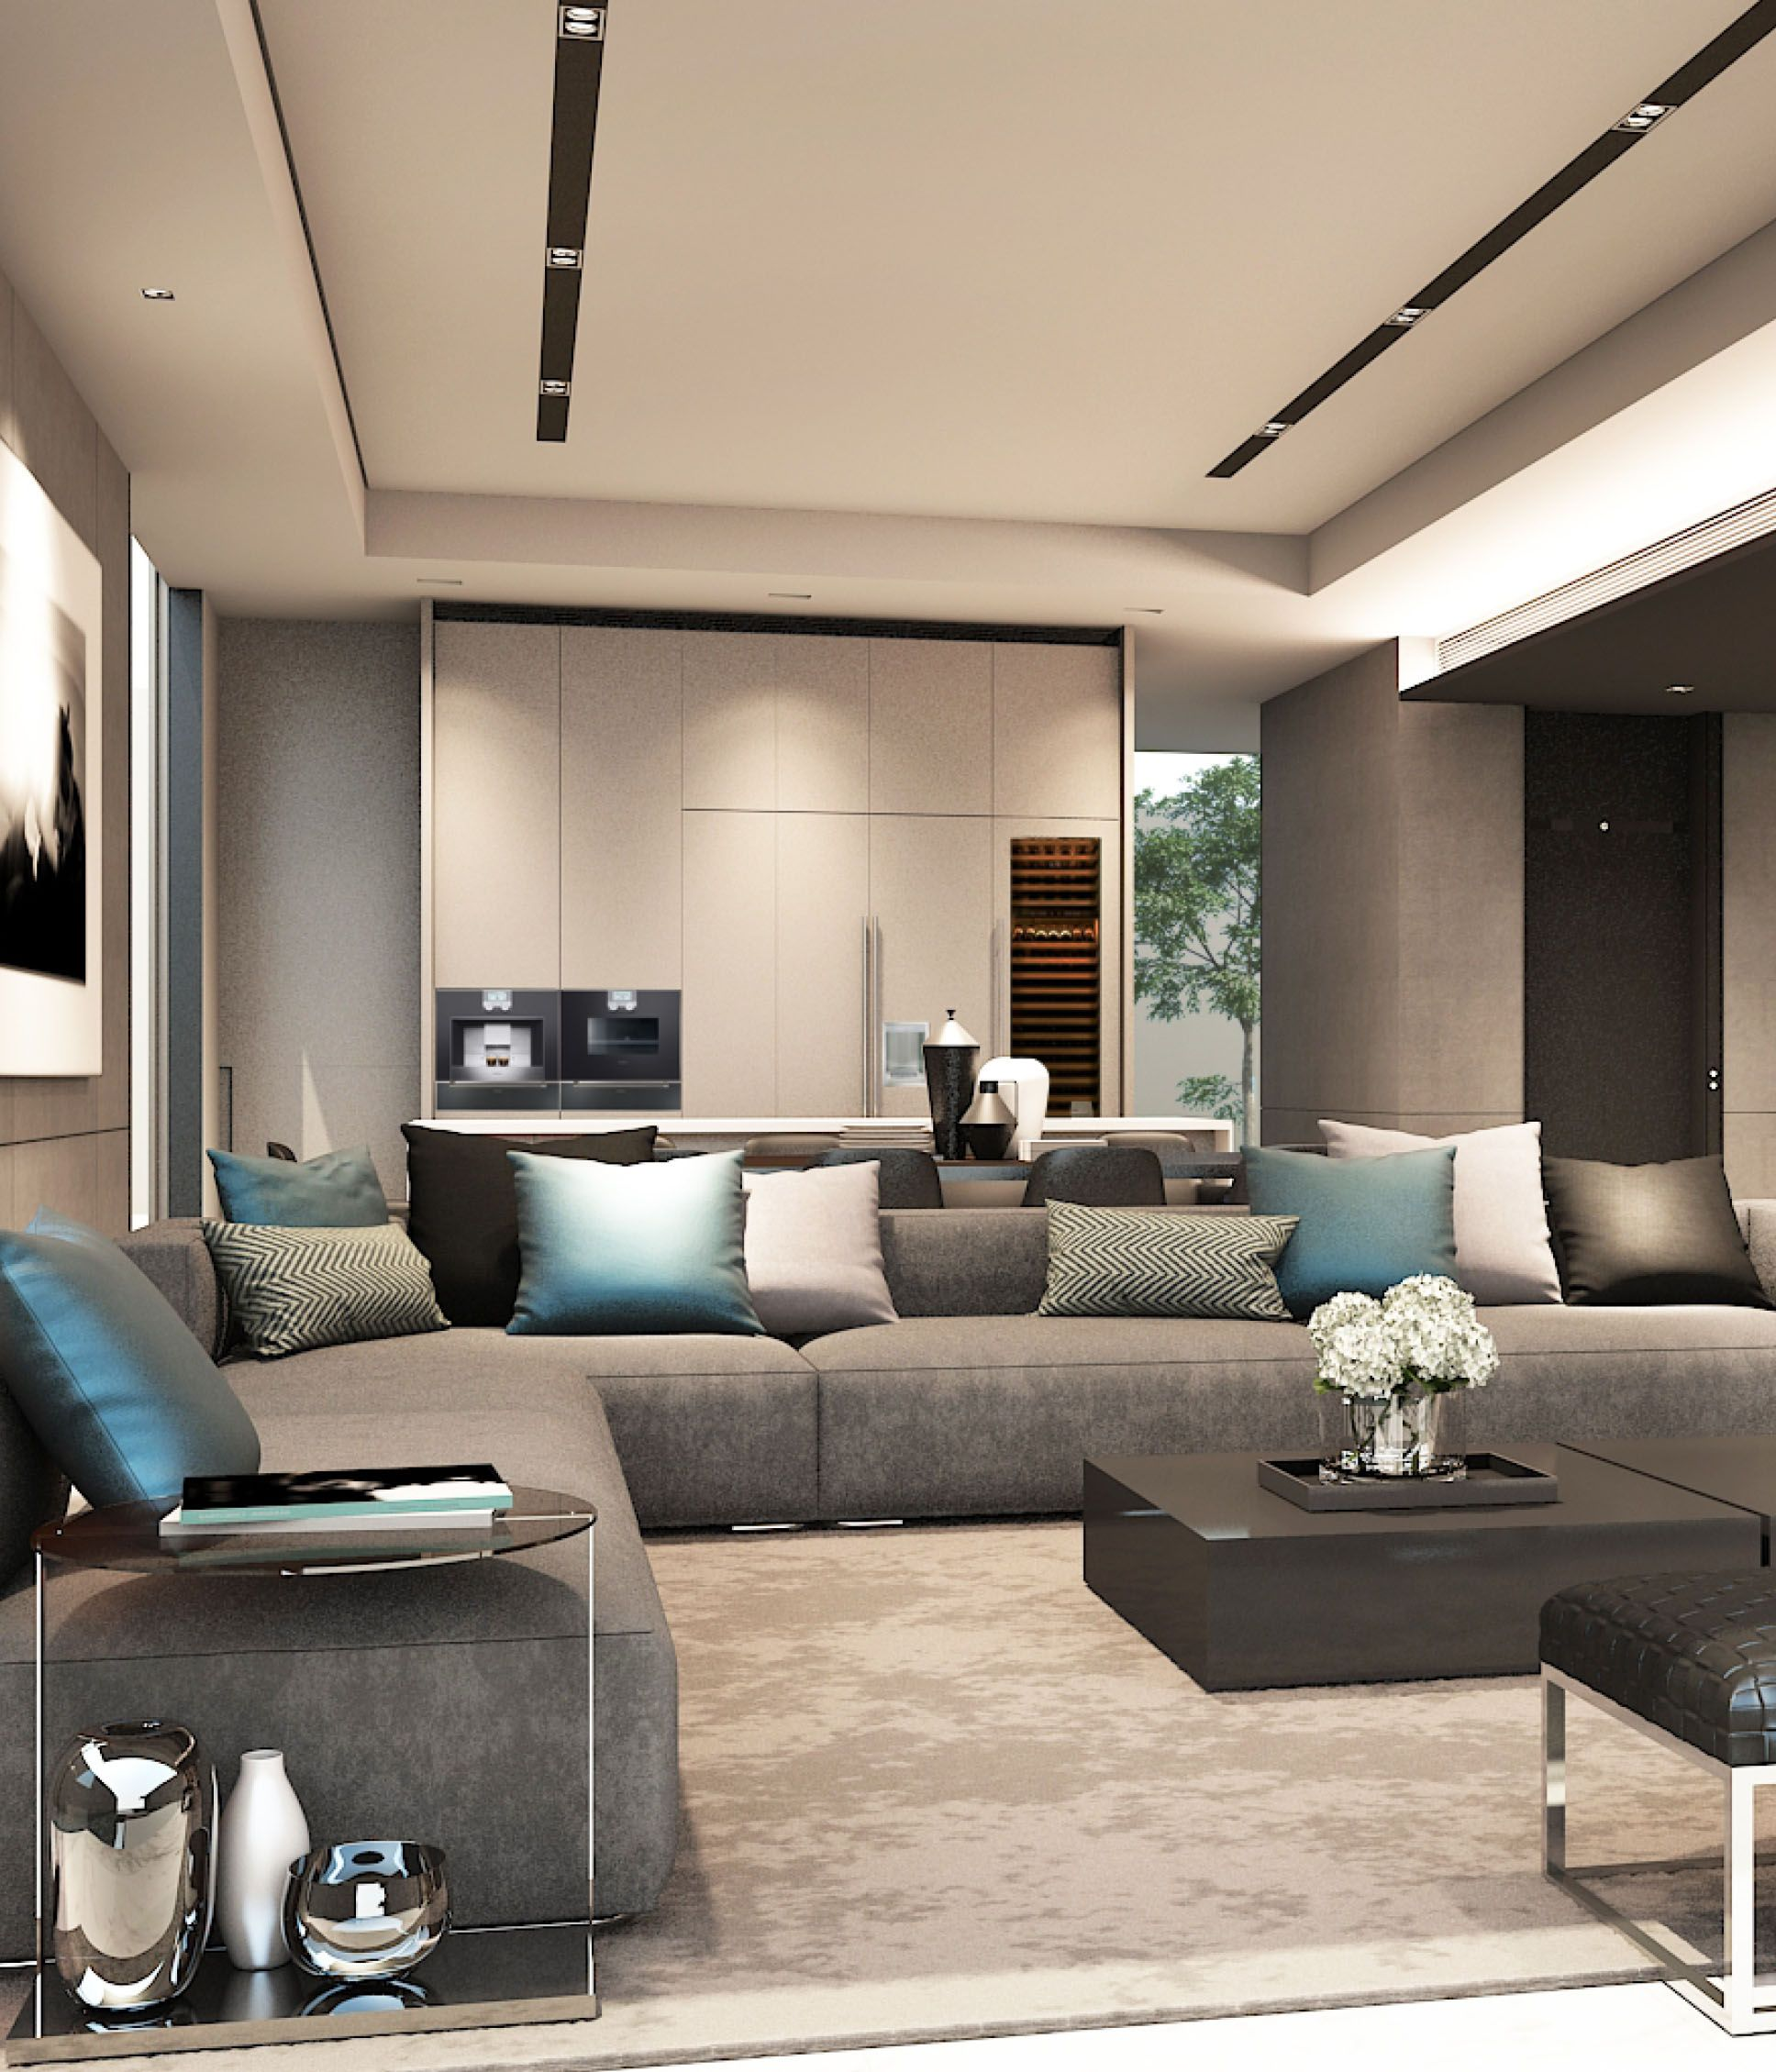 scda mixed use development sanya china show villa type 1 lounge living area